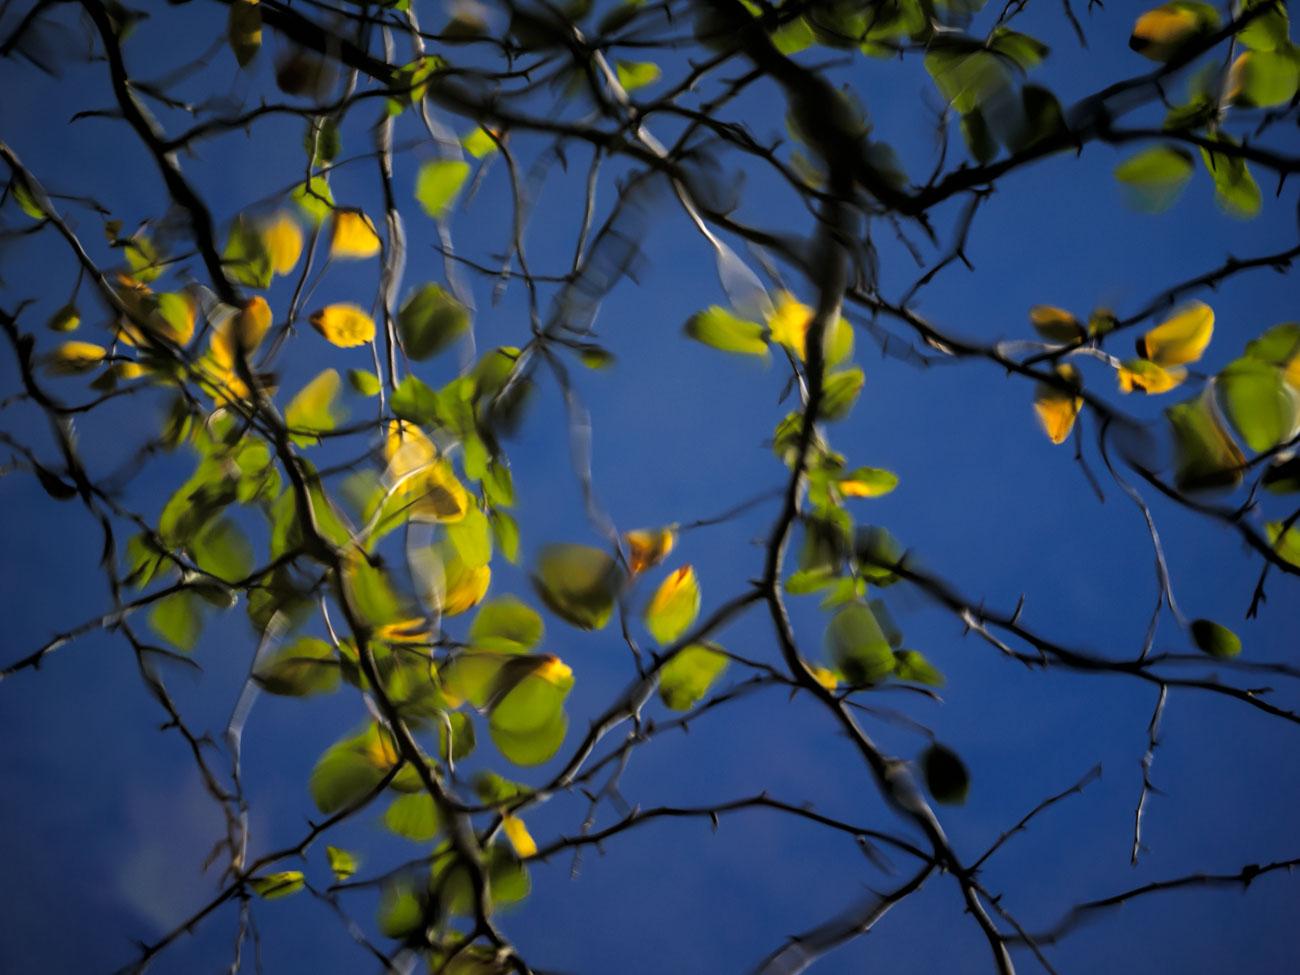 Deep Blue Reflected Sky